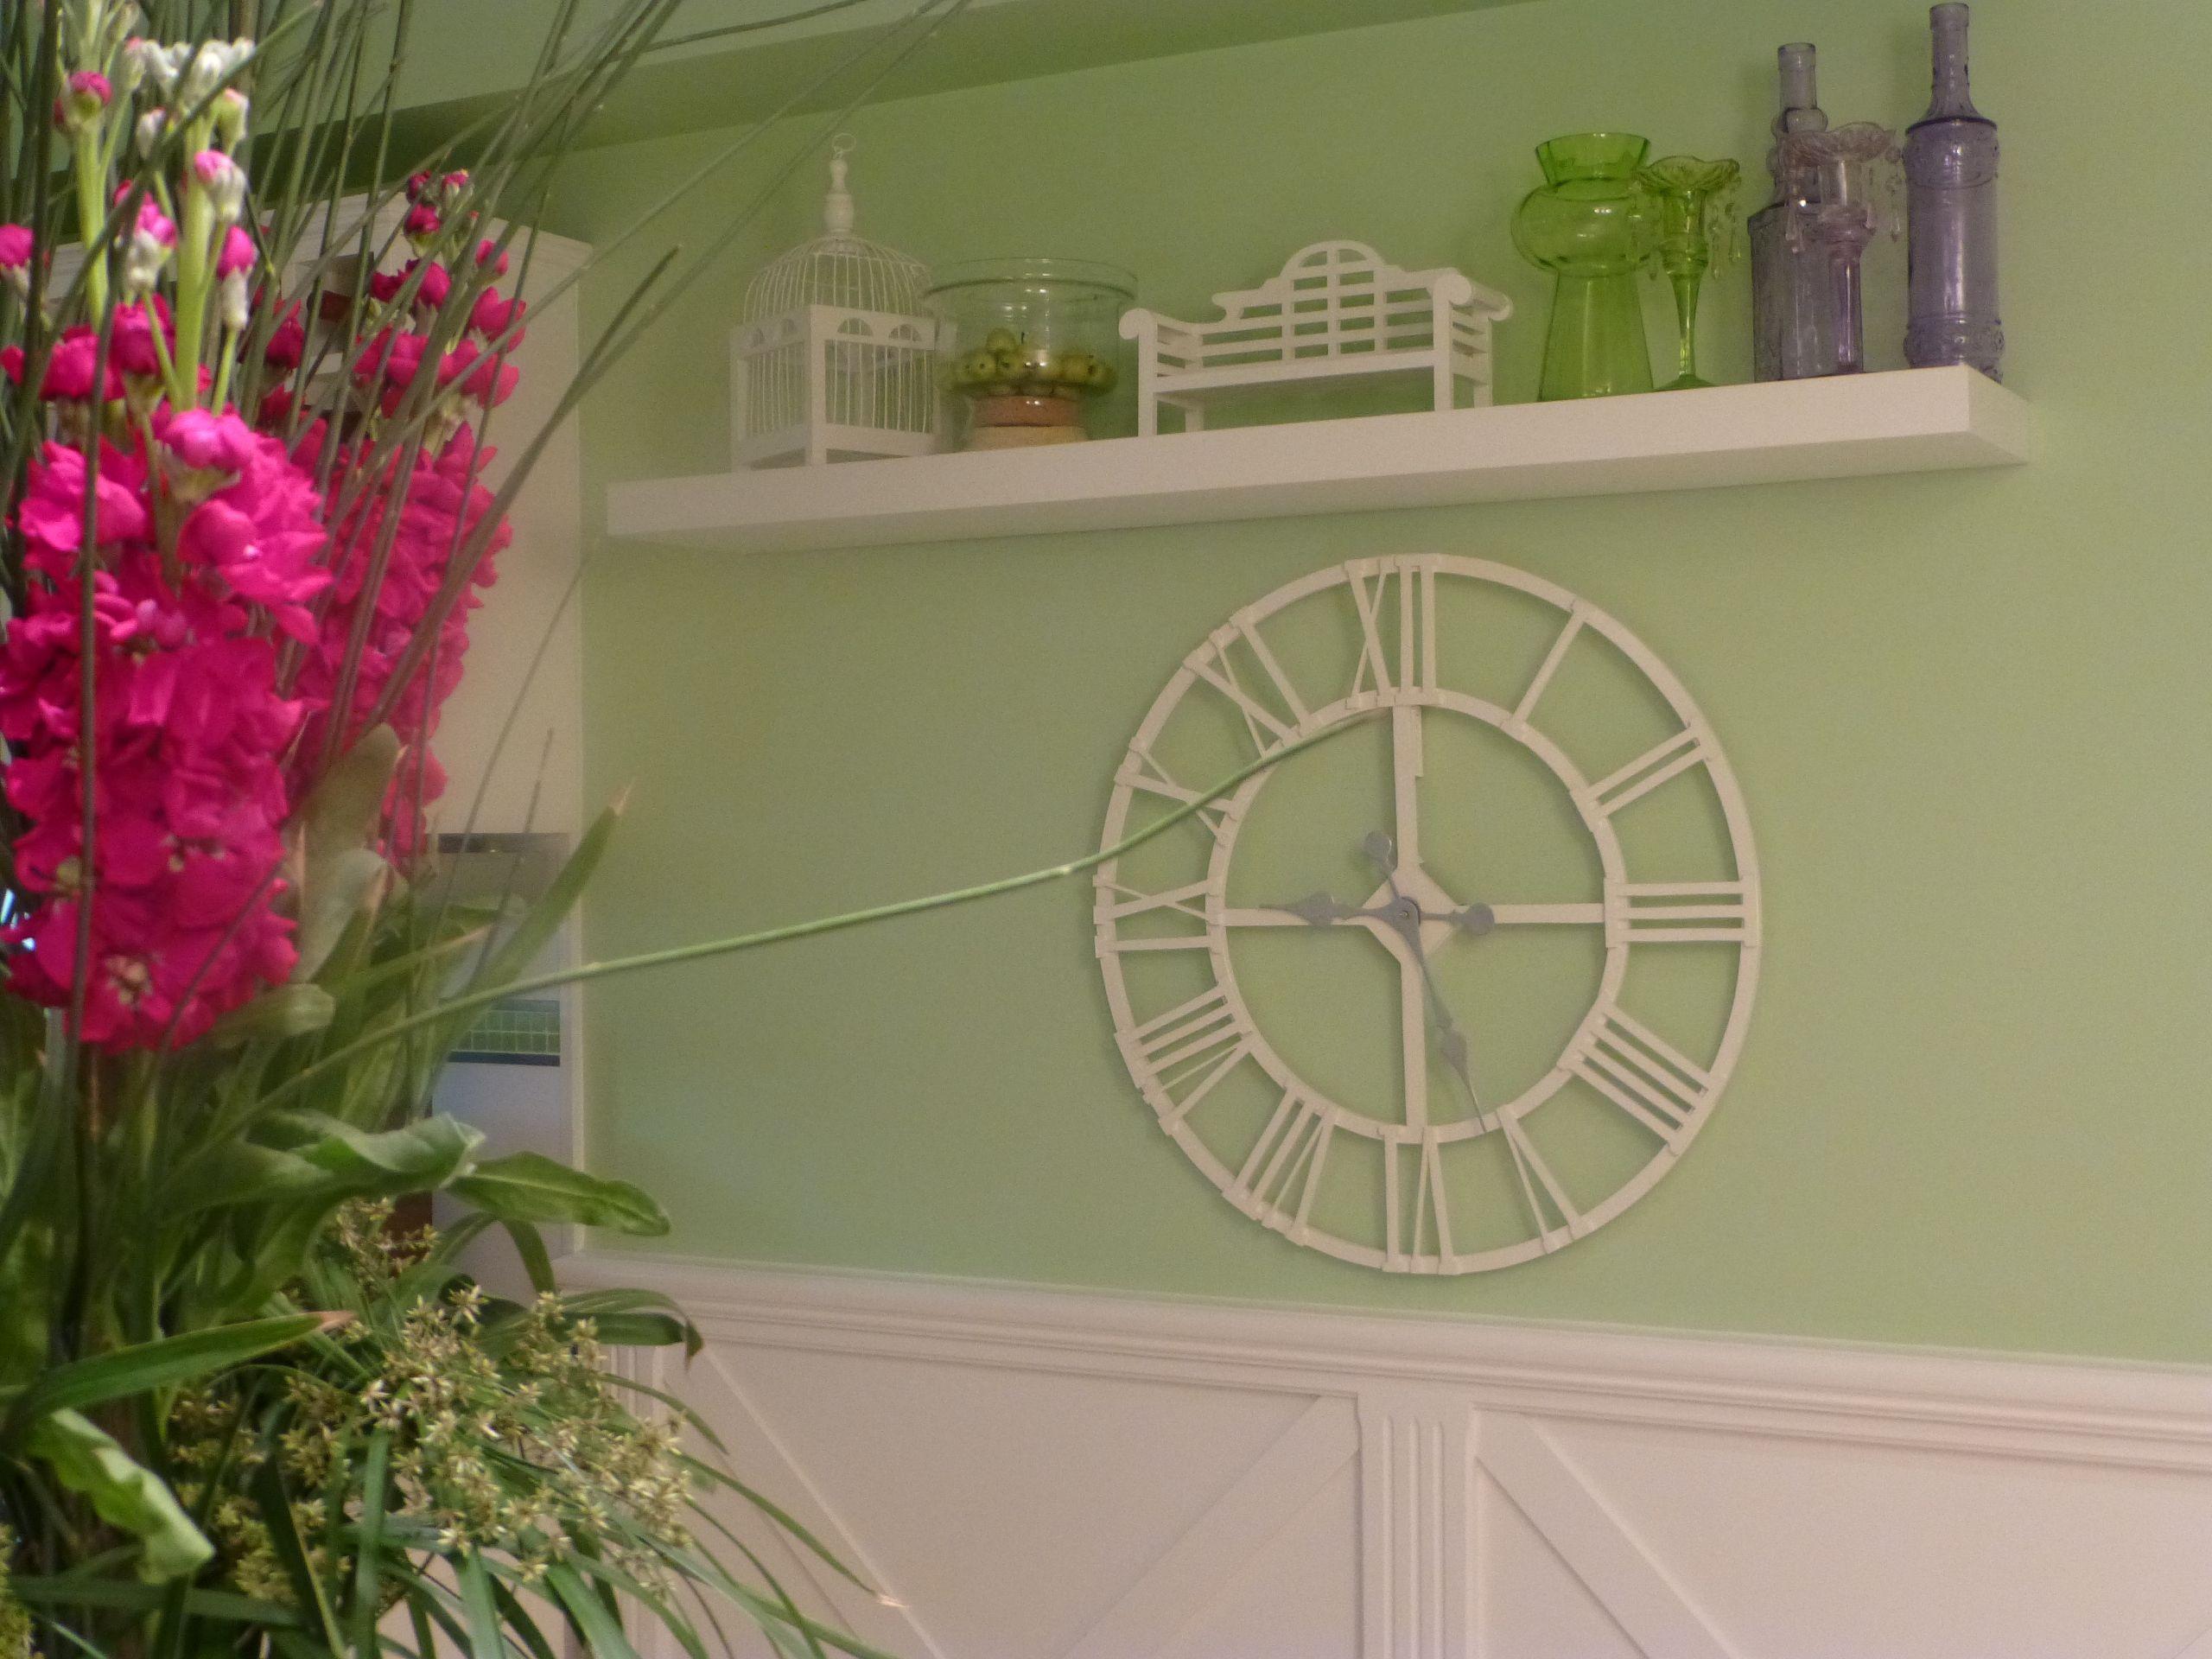 shelf and clock